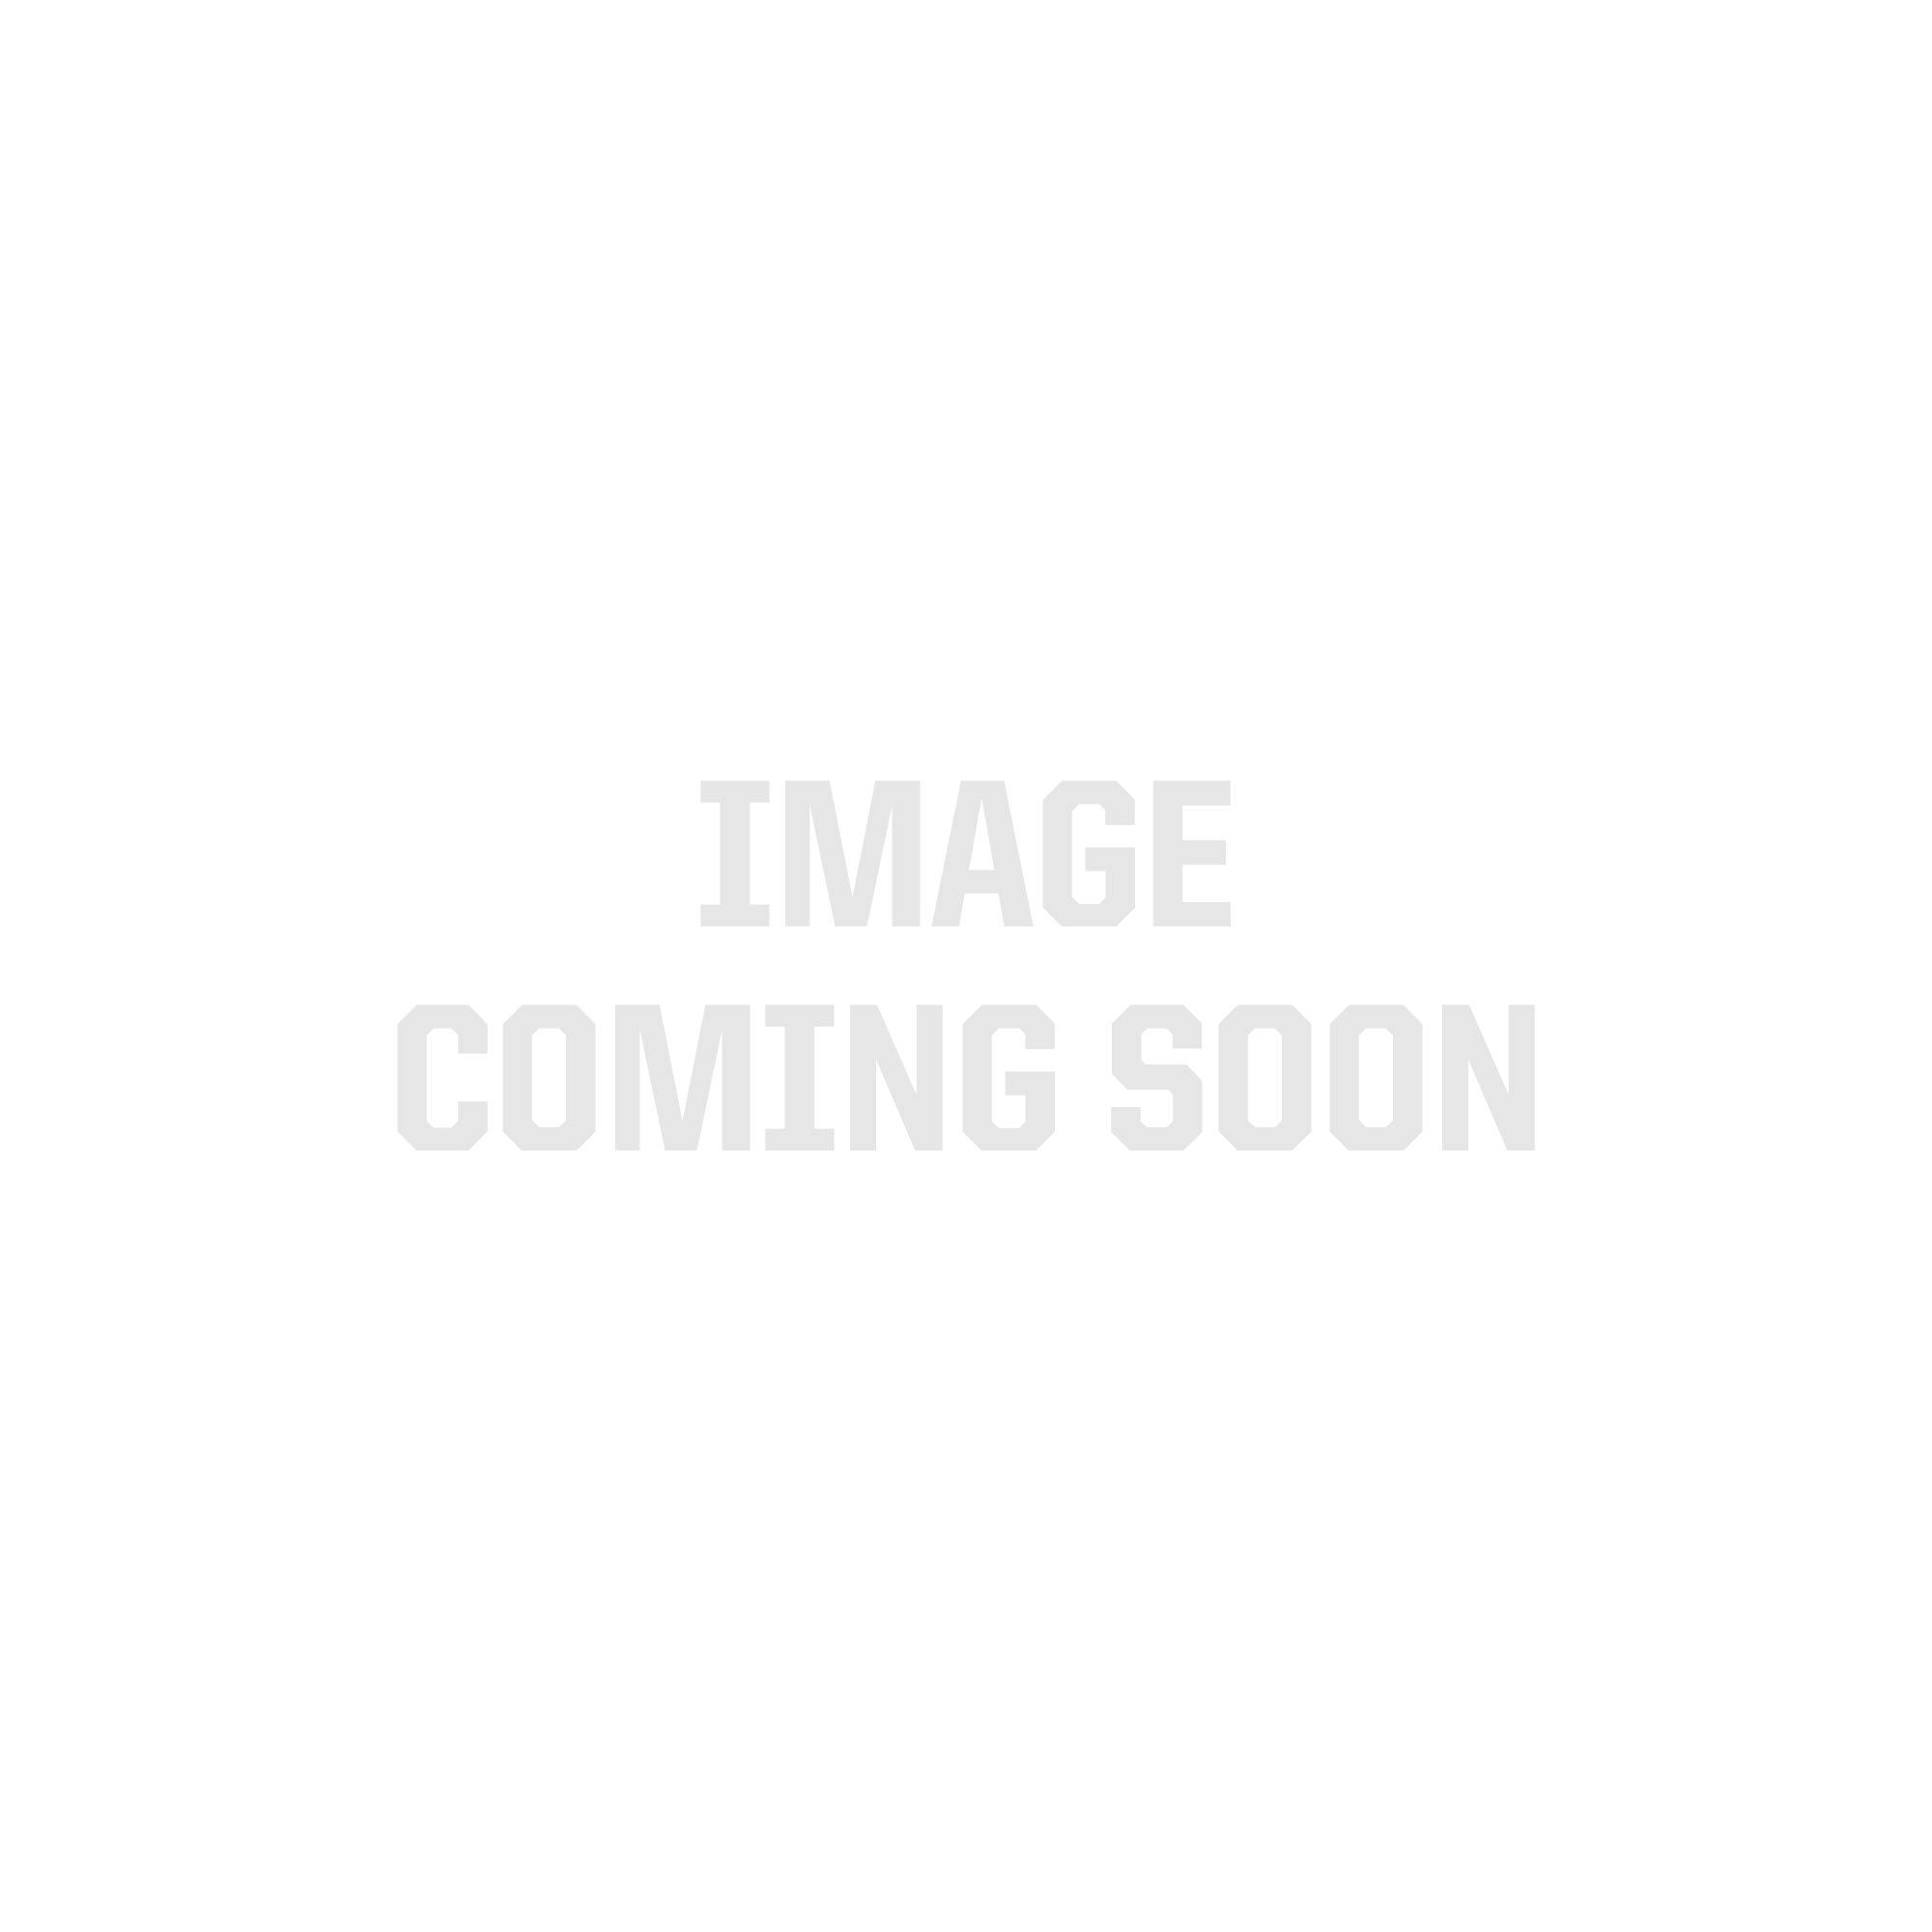 MultiCam Black™ Covert Box Messenger - New Gear - Advent Calendar - 5.11  Tactical f7693c23ef584